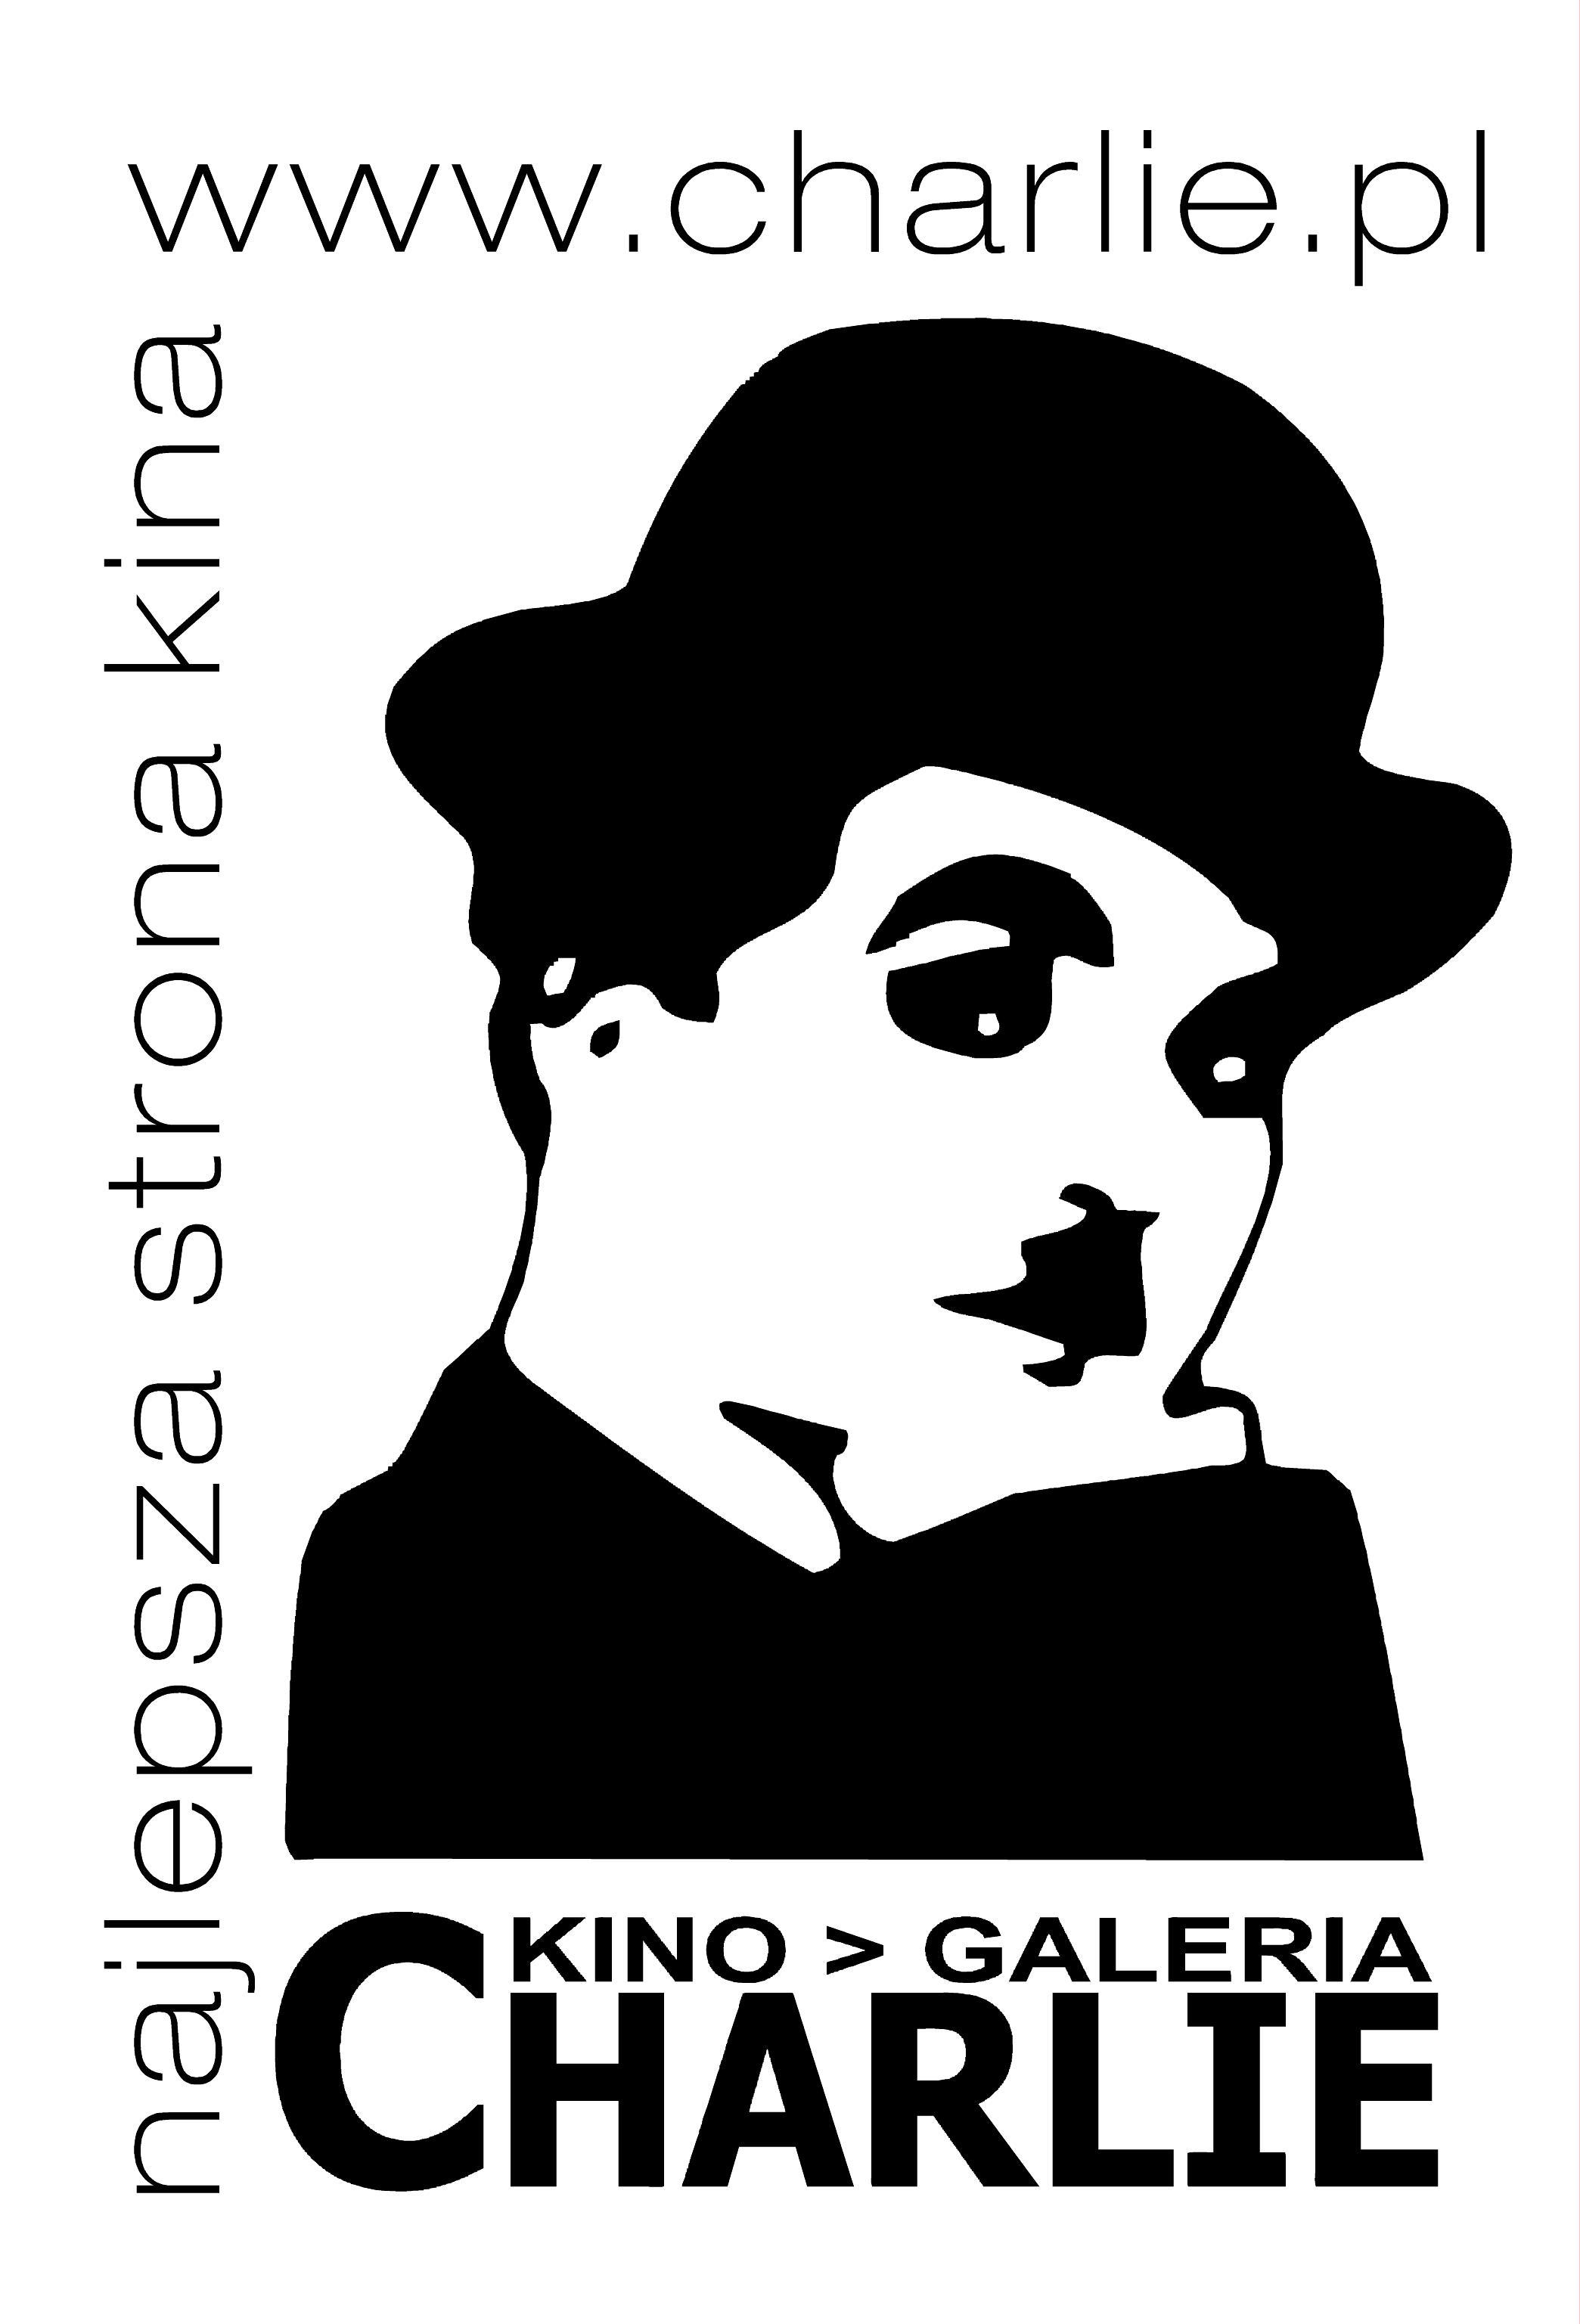 Kino_CHARLIE_logo_kina